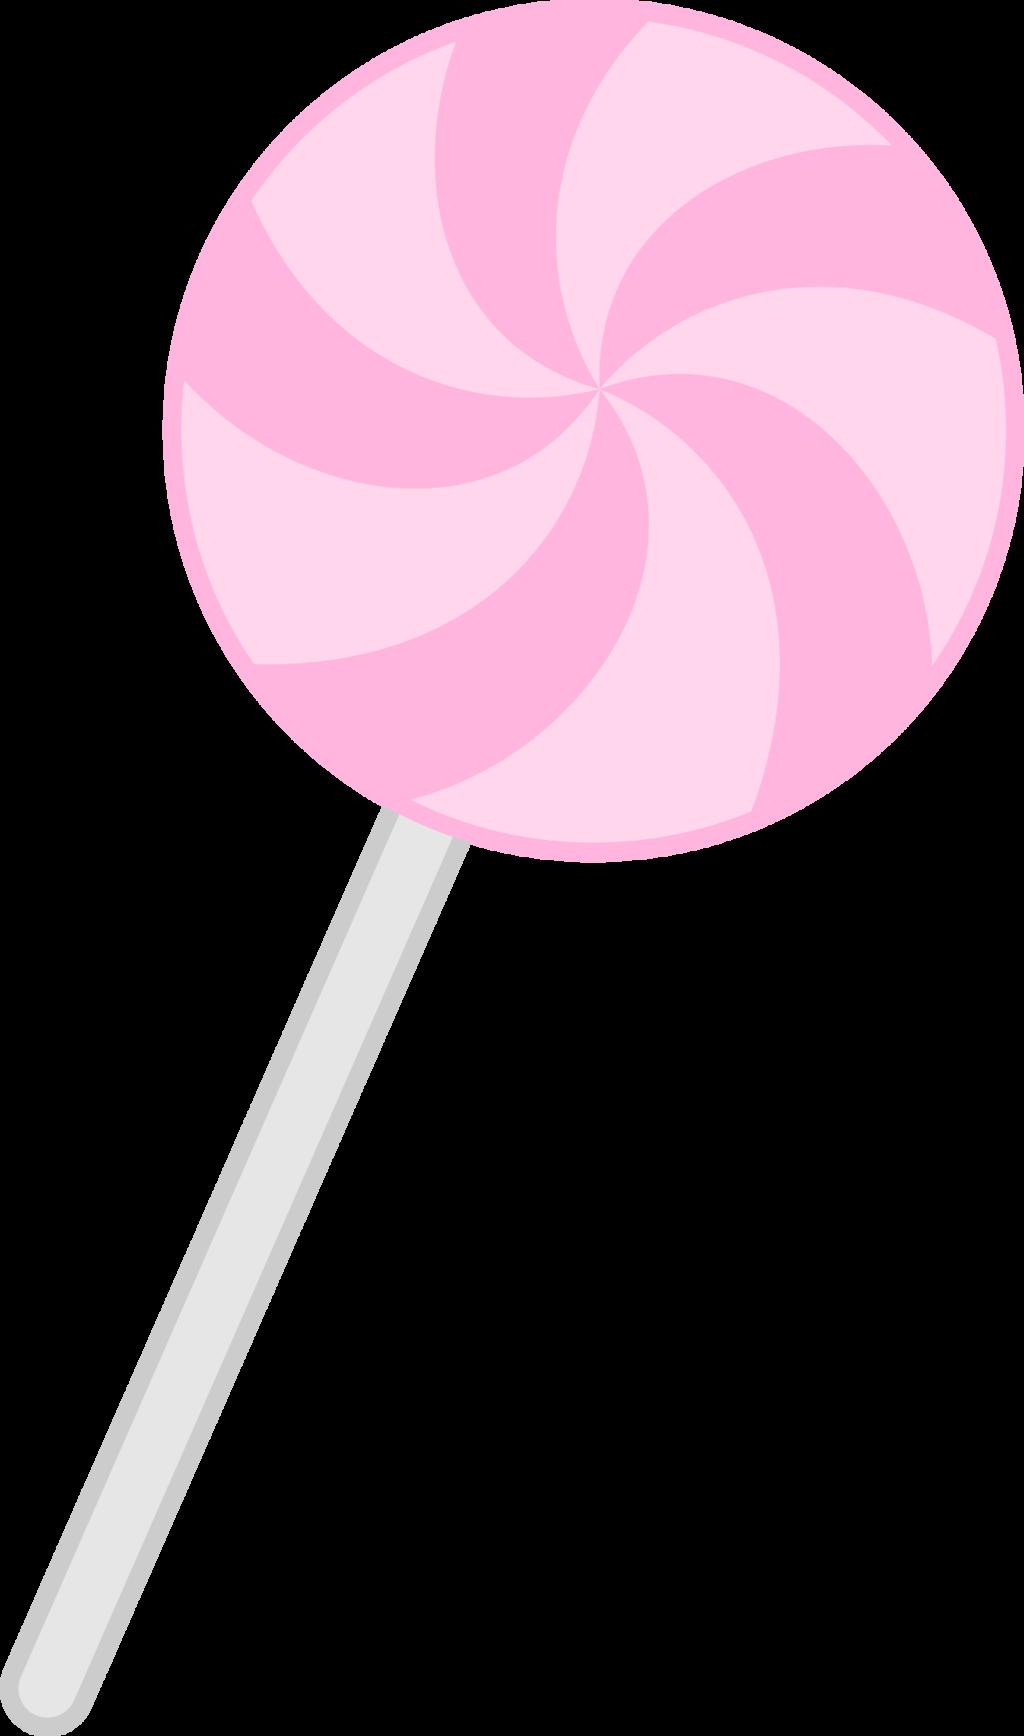 Lolipop cutie mark oc. Lollipop clipart pink lollipop